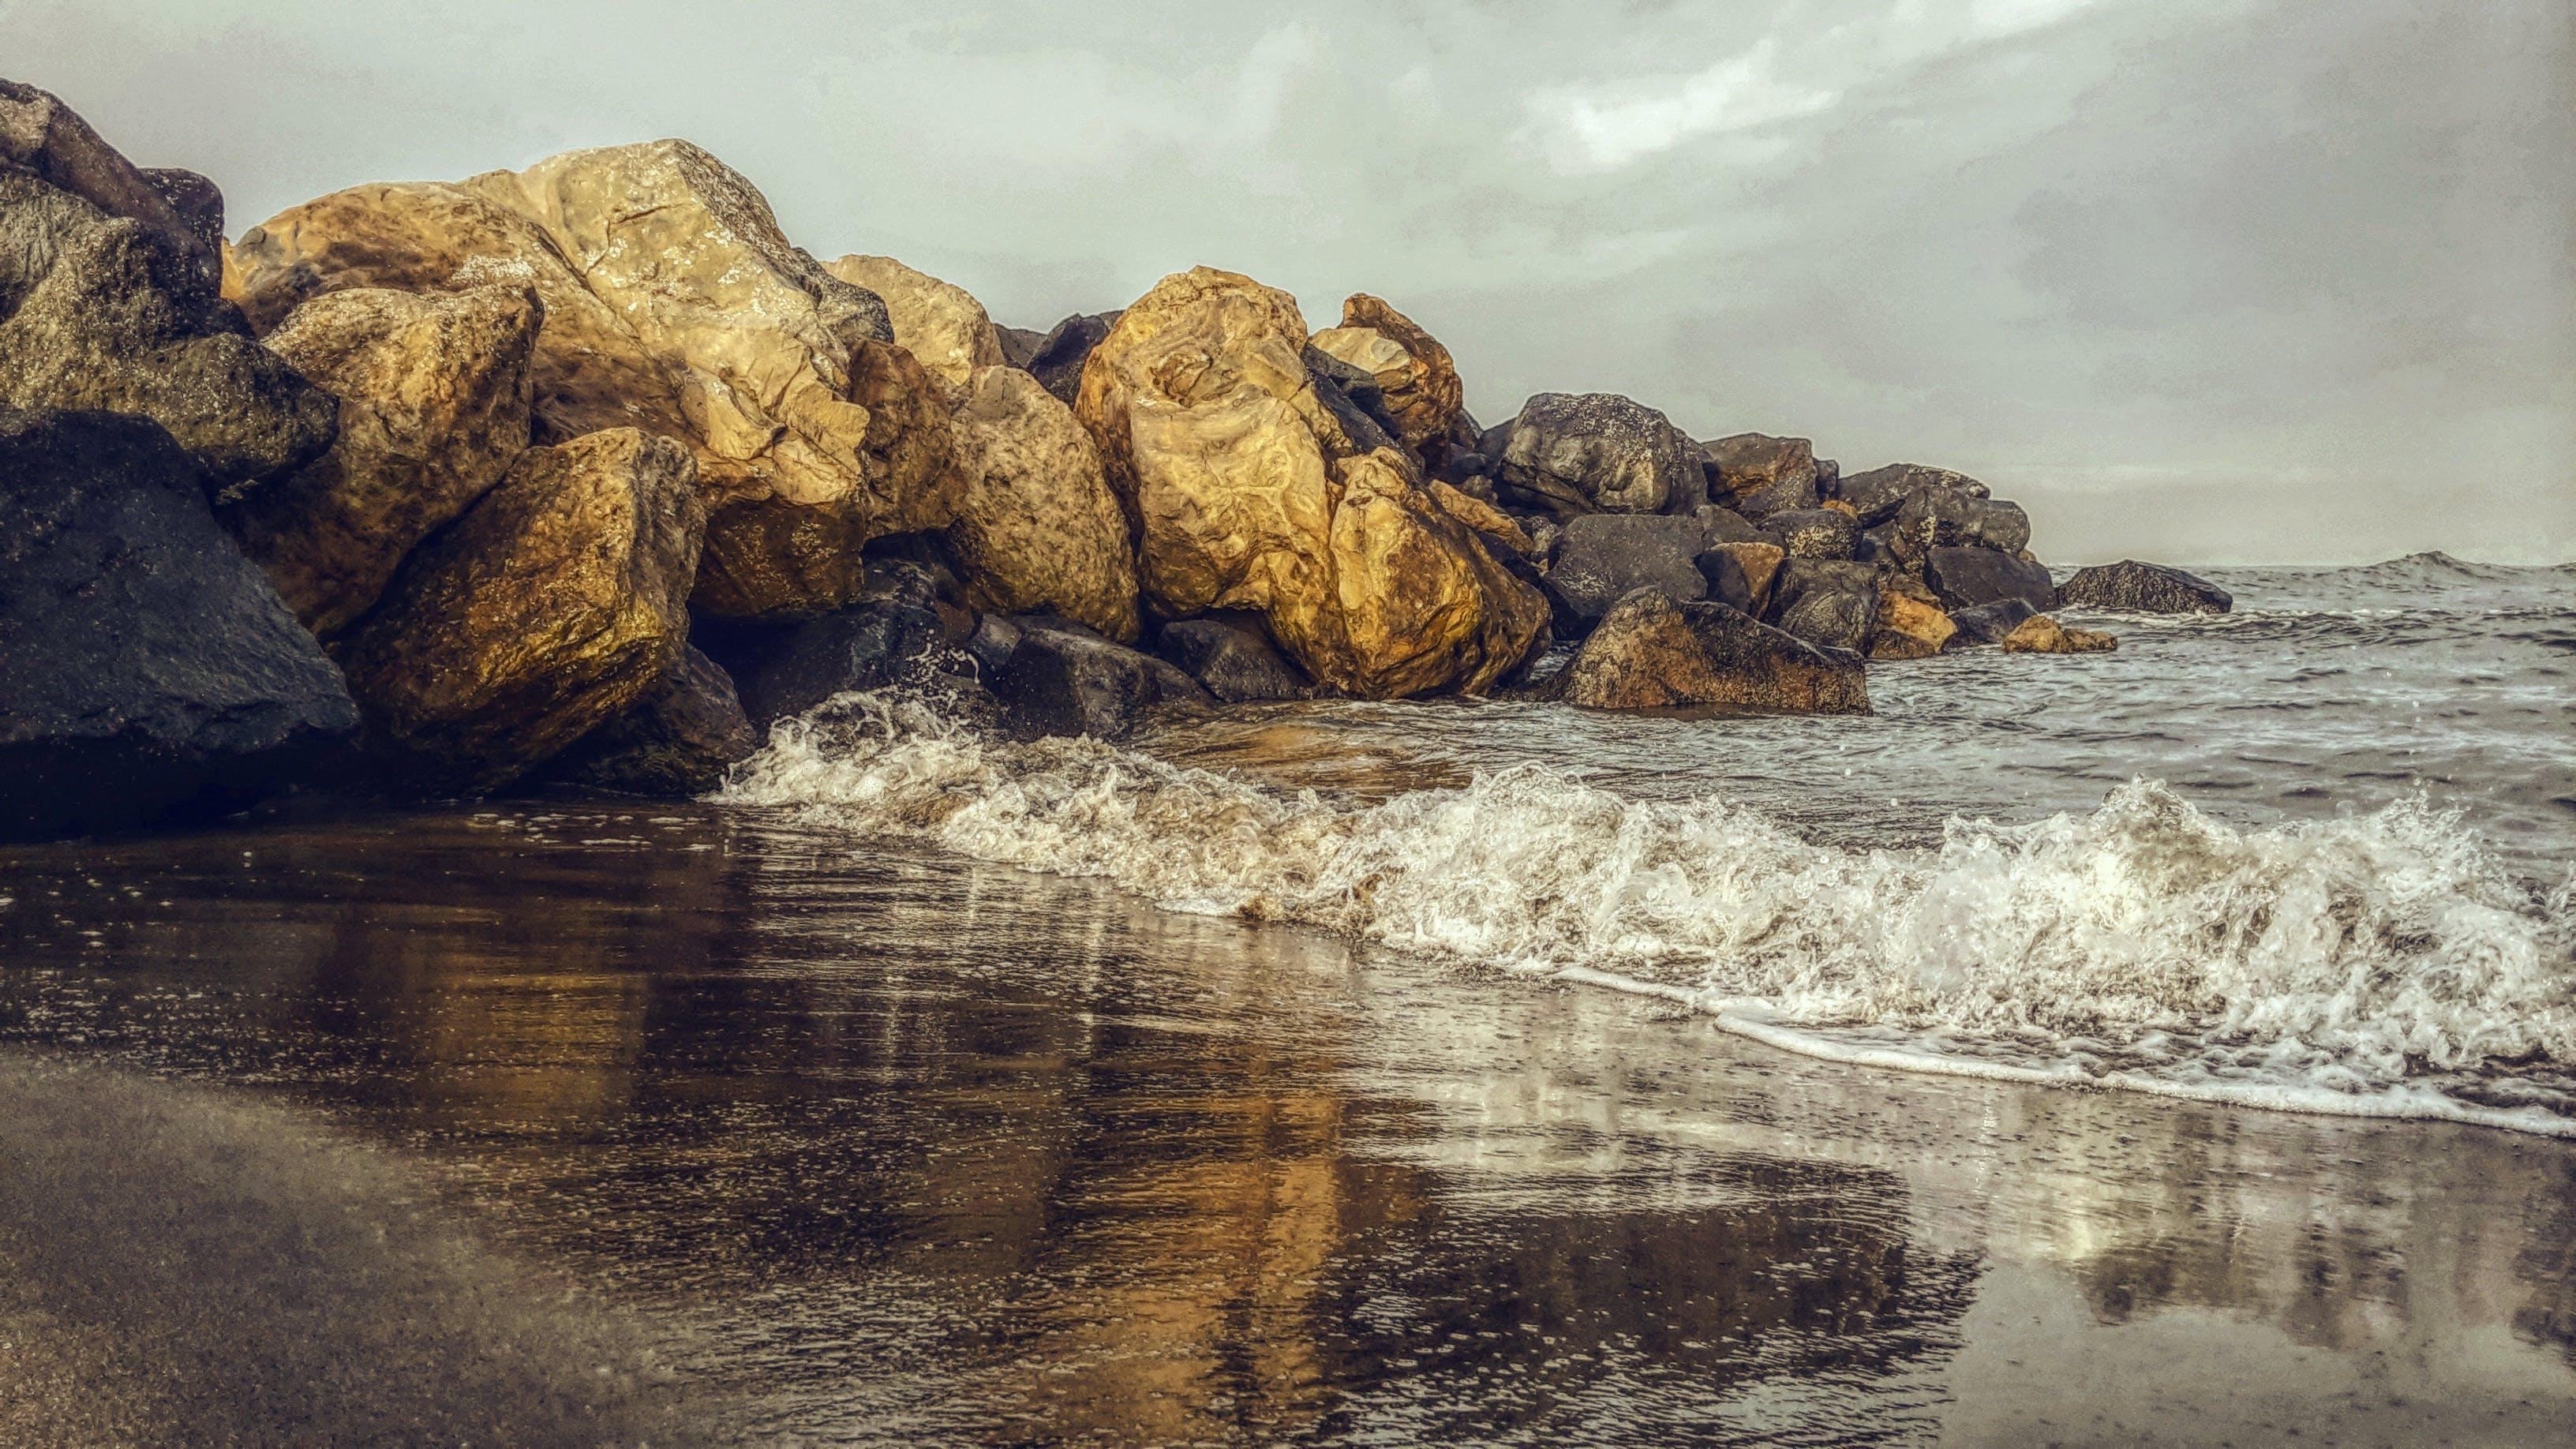 beach, beautiful, boulders